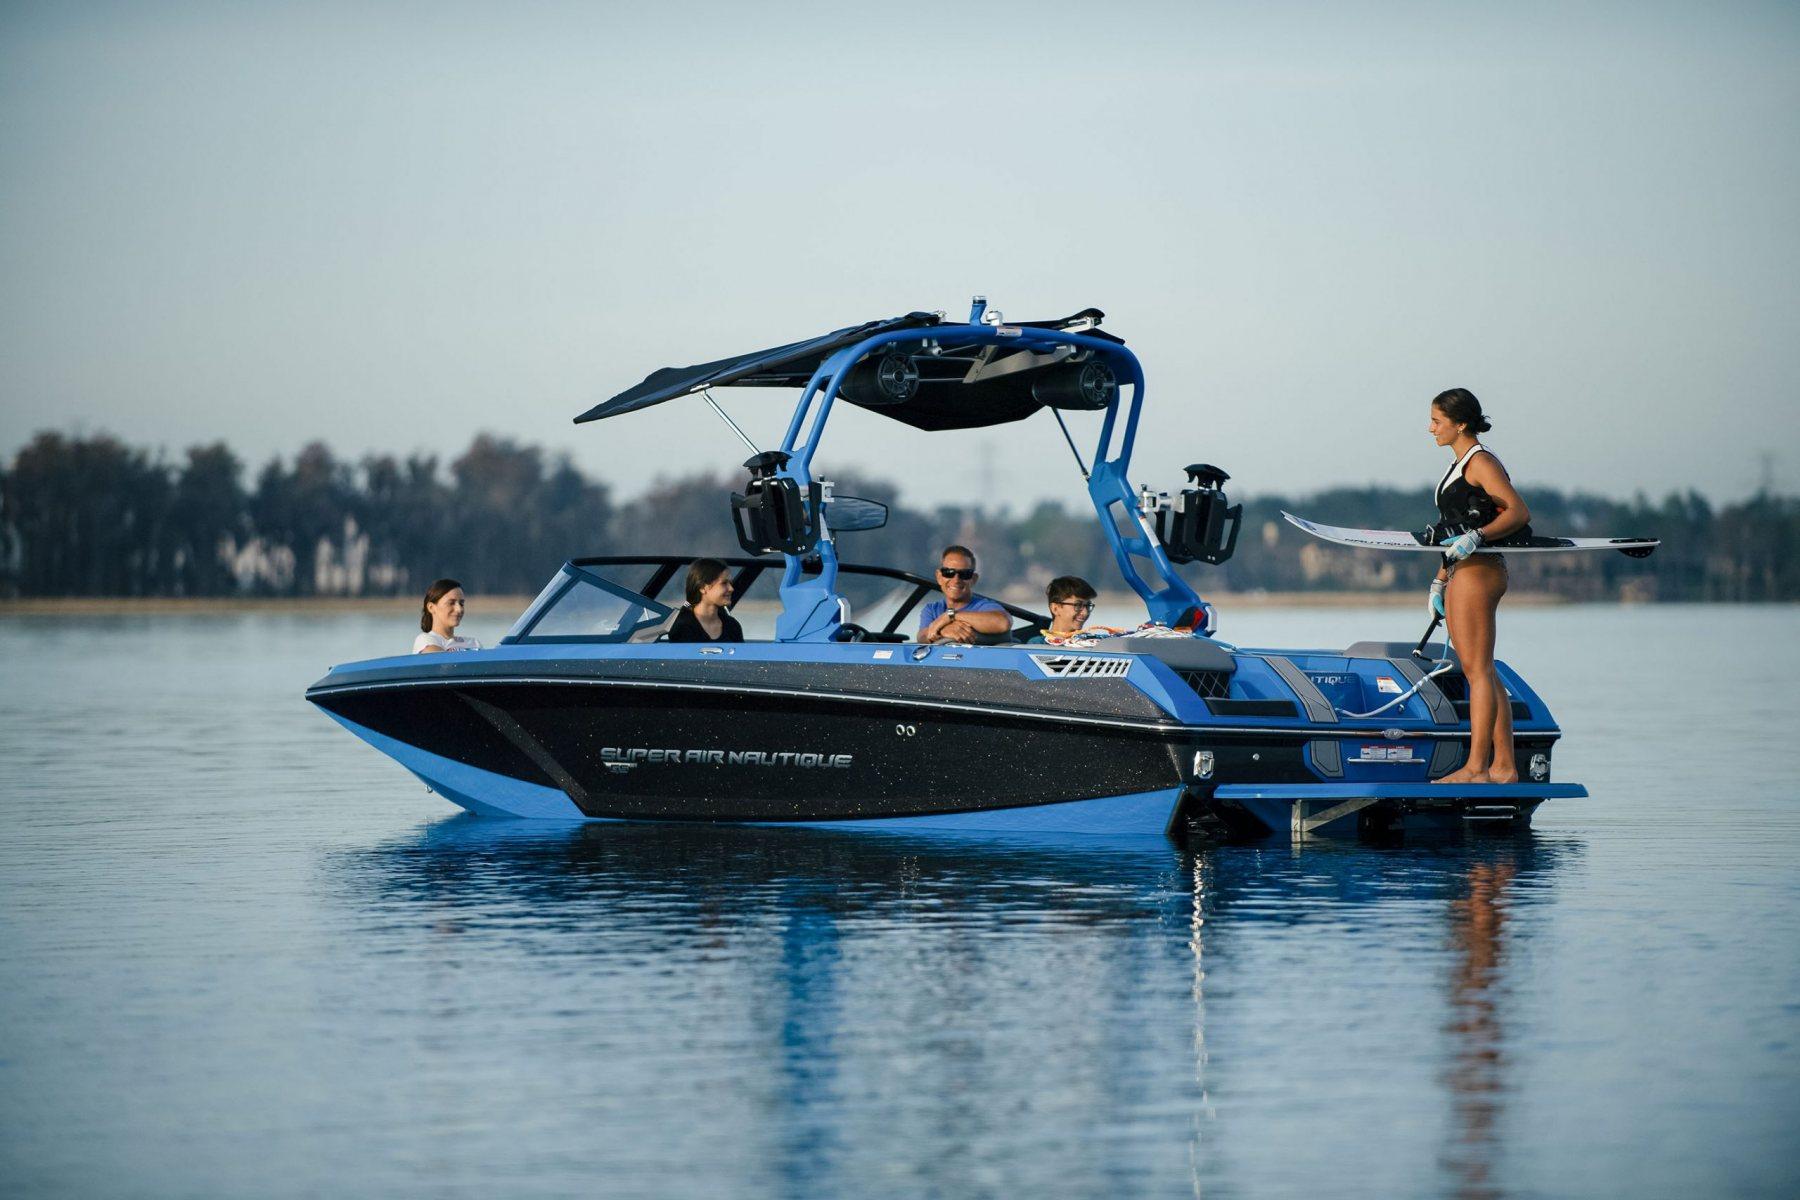 Jet Black Metal Flake on the 2022 Nautique GS22 Wake Boat